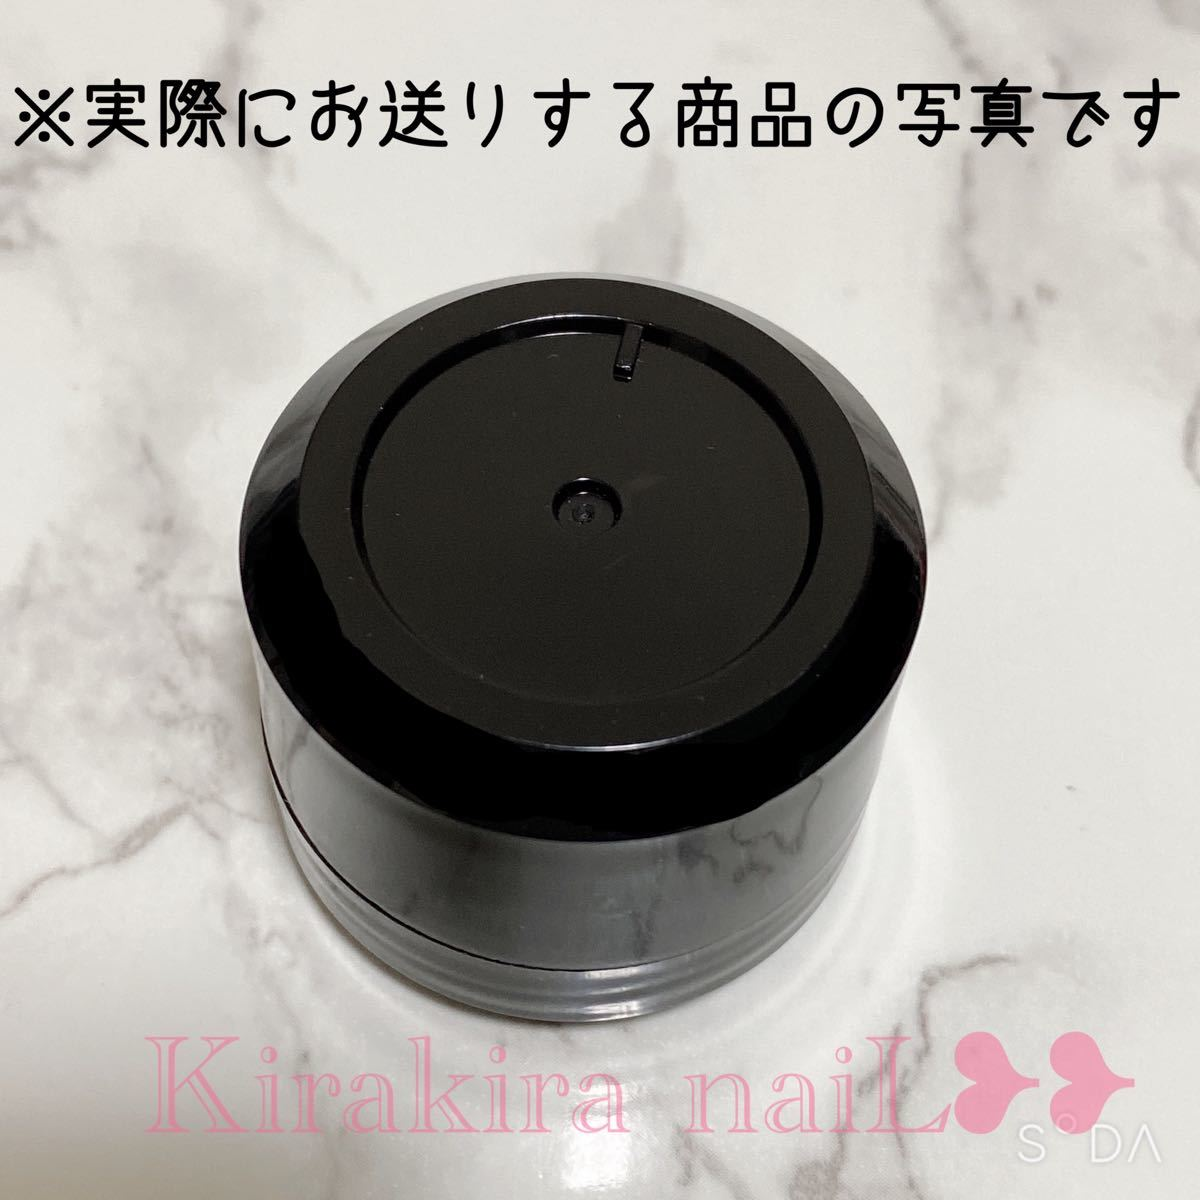 New★全12種☆Venalisa☆グリッタージェル☆カラーラメジェル P56